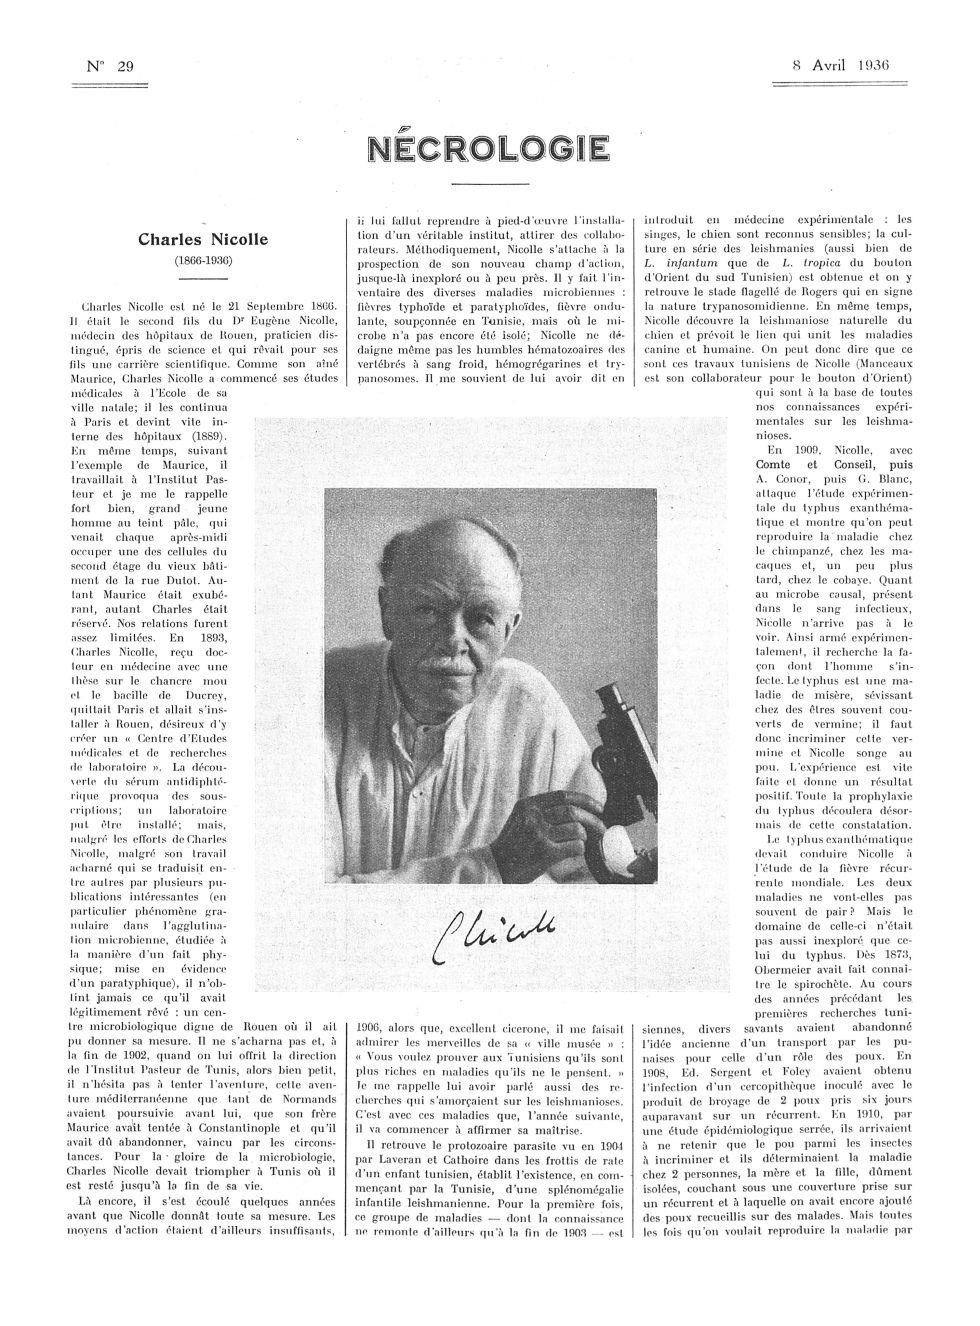 Charles Nicolle (1866-1936) - La Presse médicale - [Articles originaux] -  - med100000x1936xartorigx0595